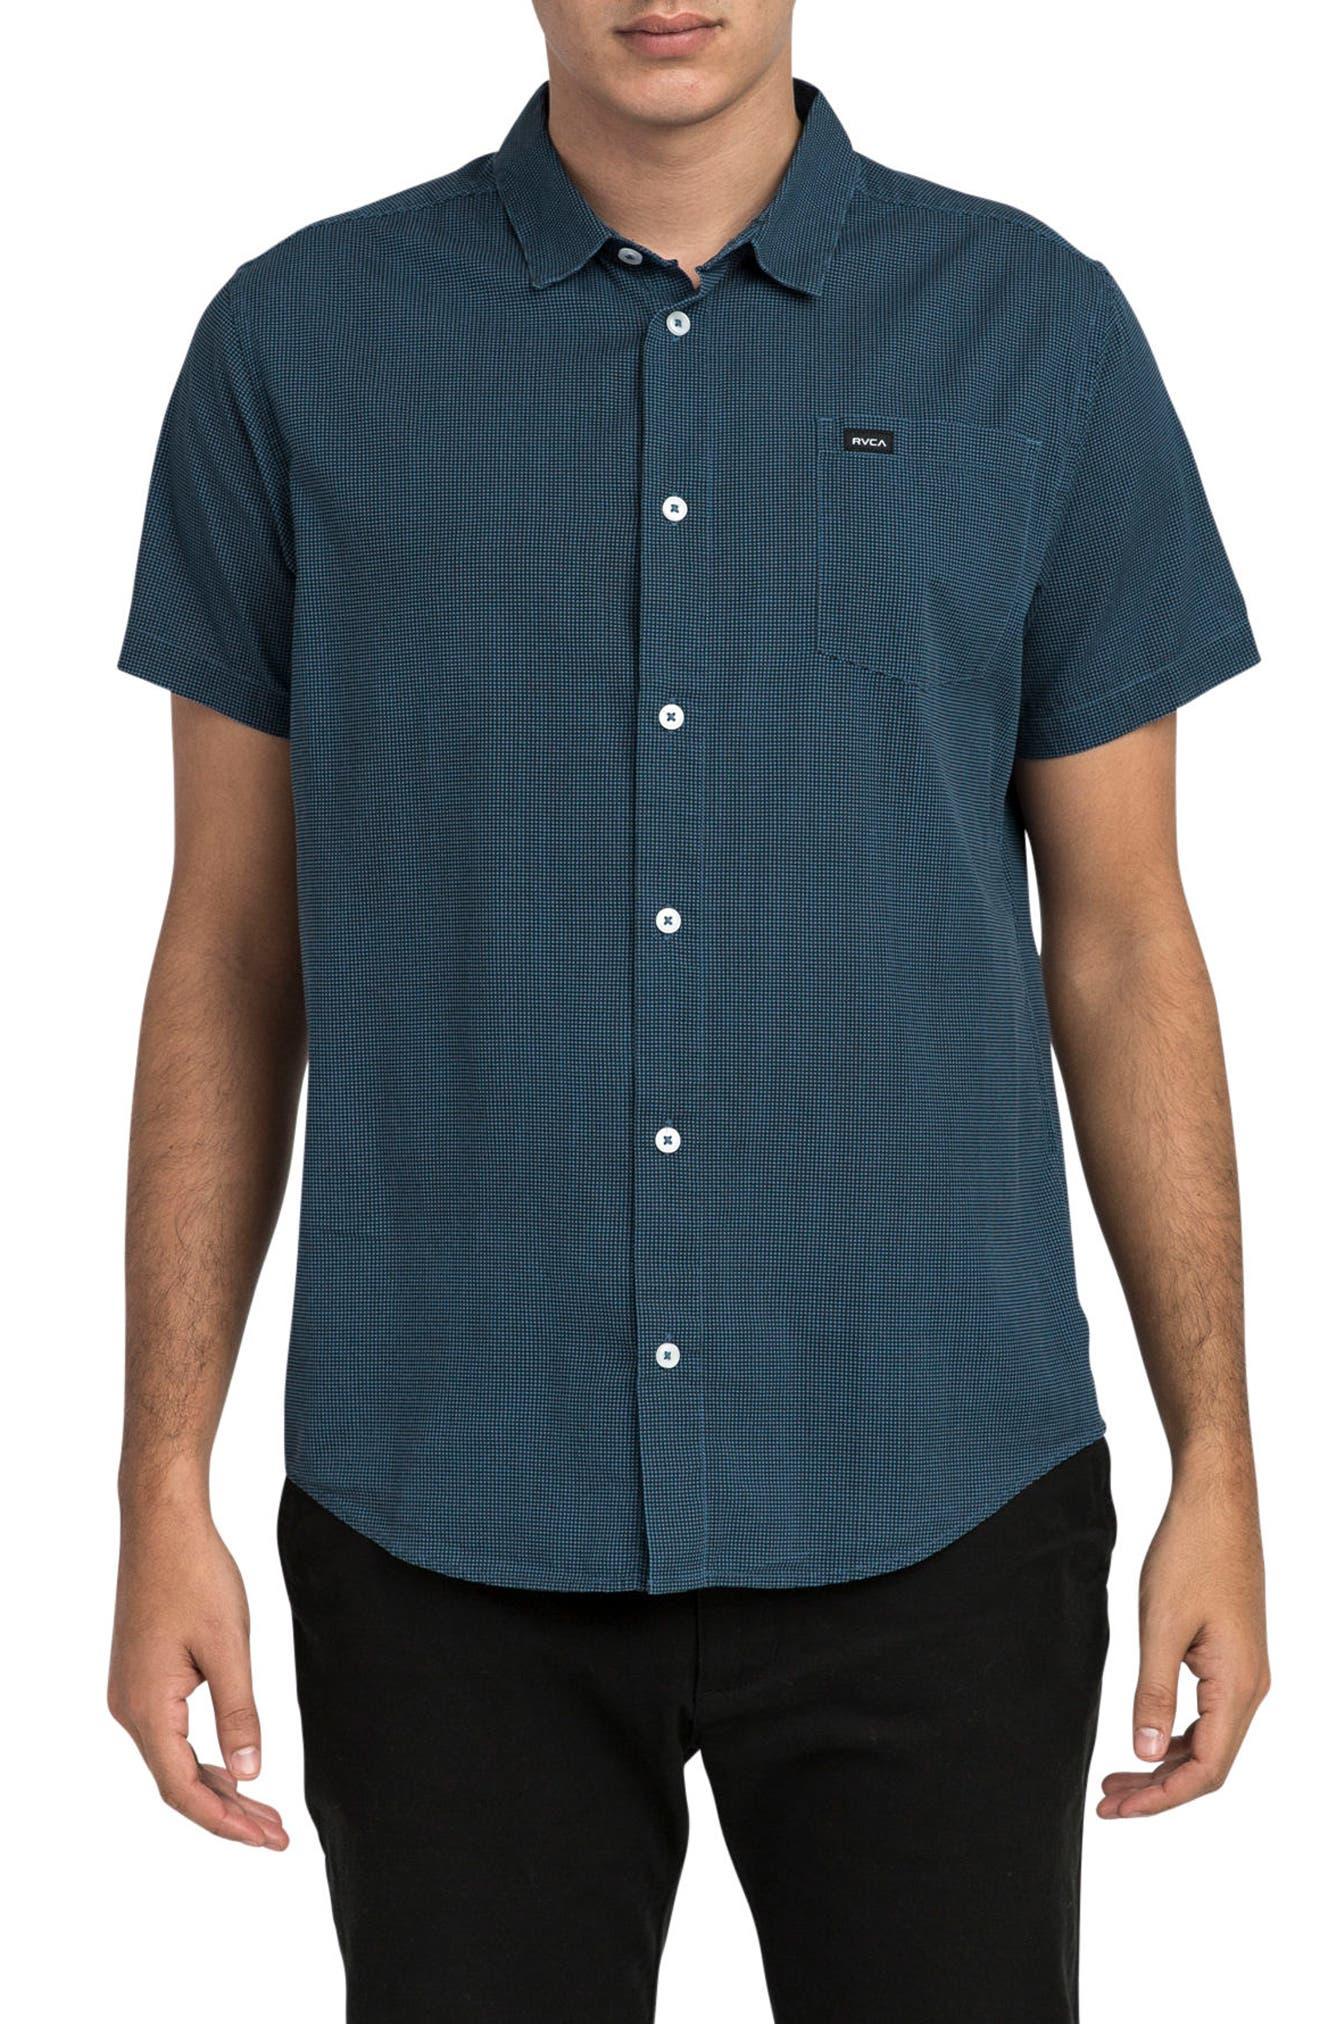 No Name Woven Shirt,                         Main,                         color, Dark Denim